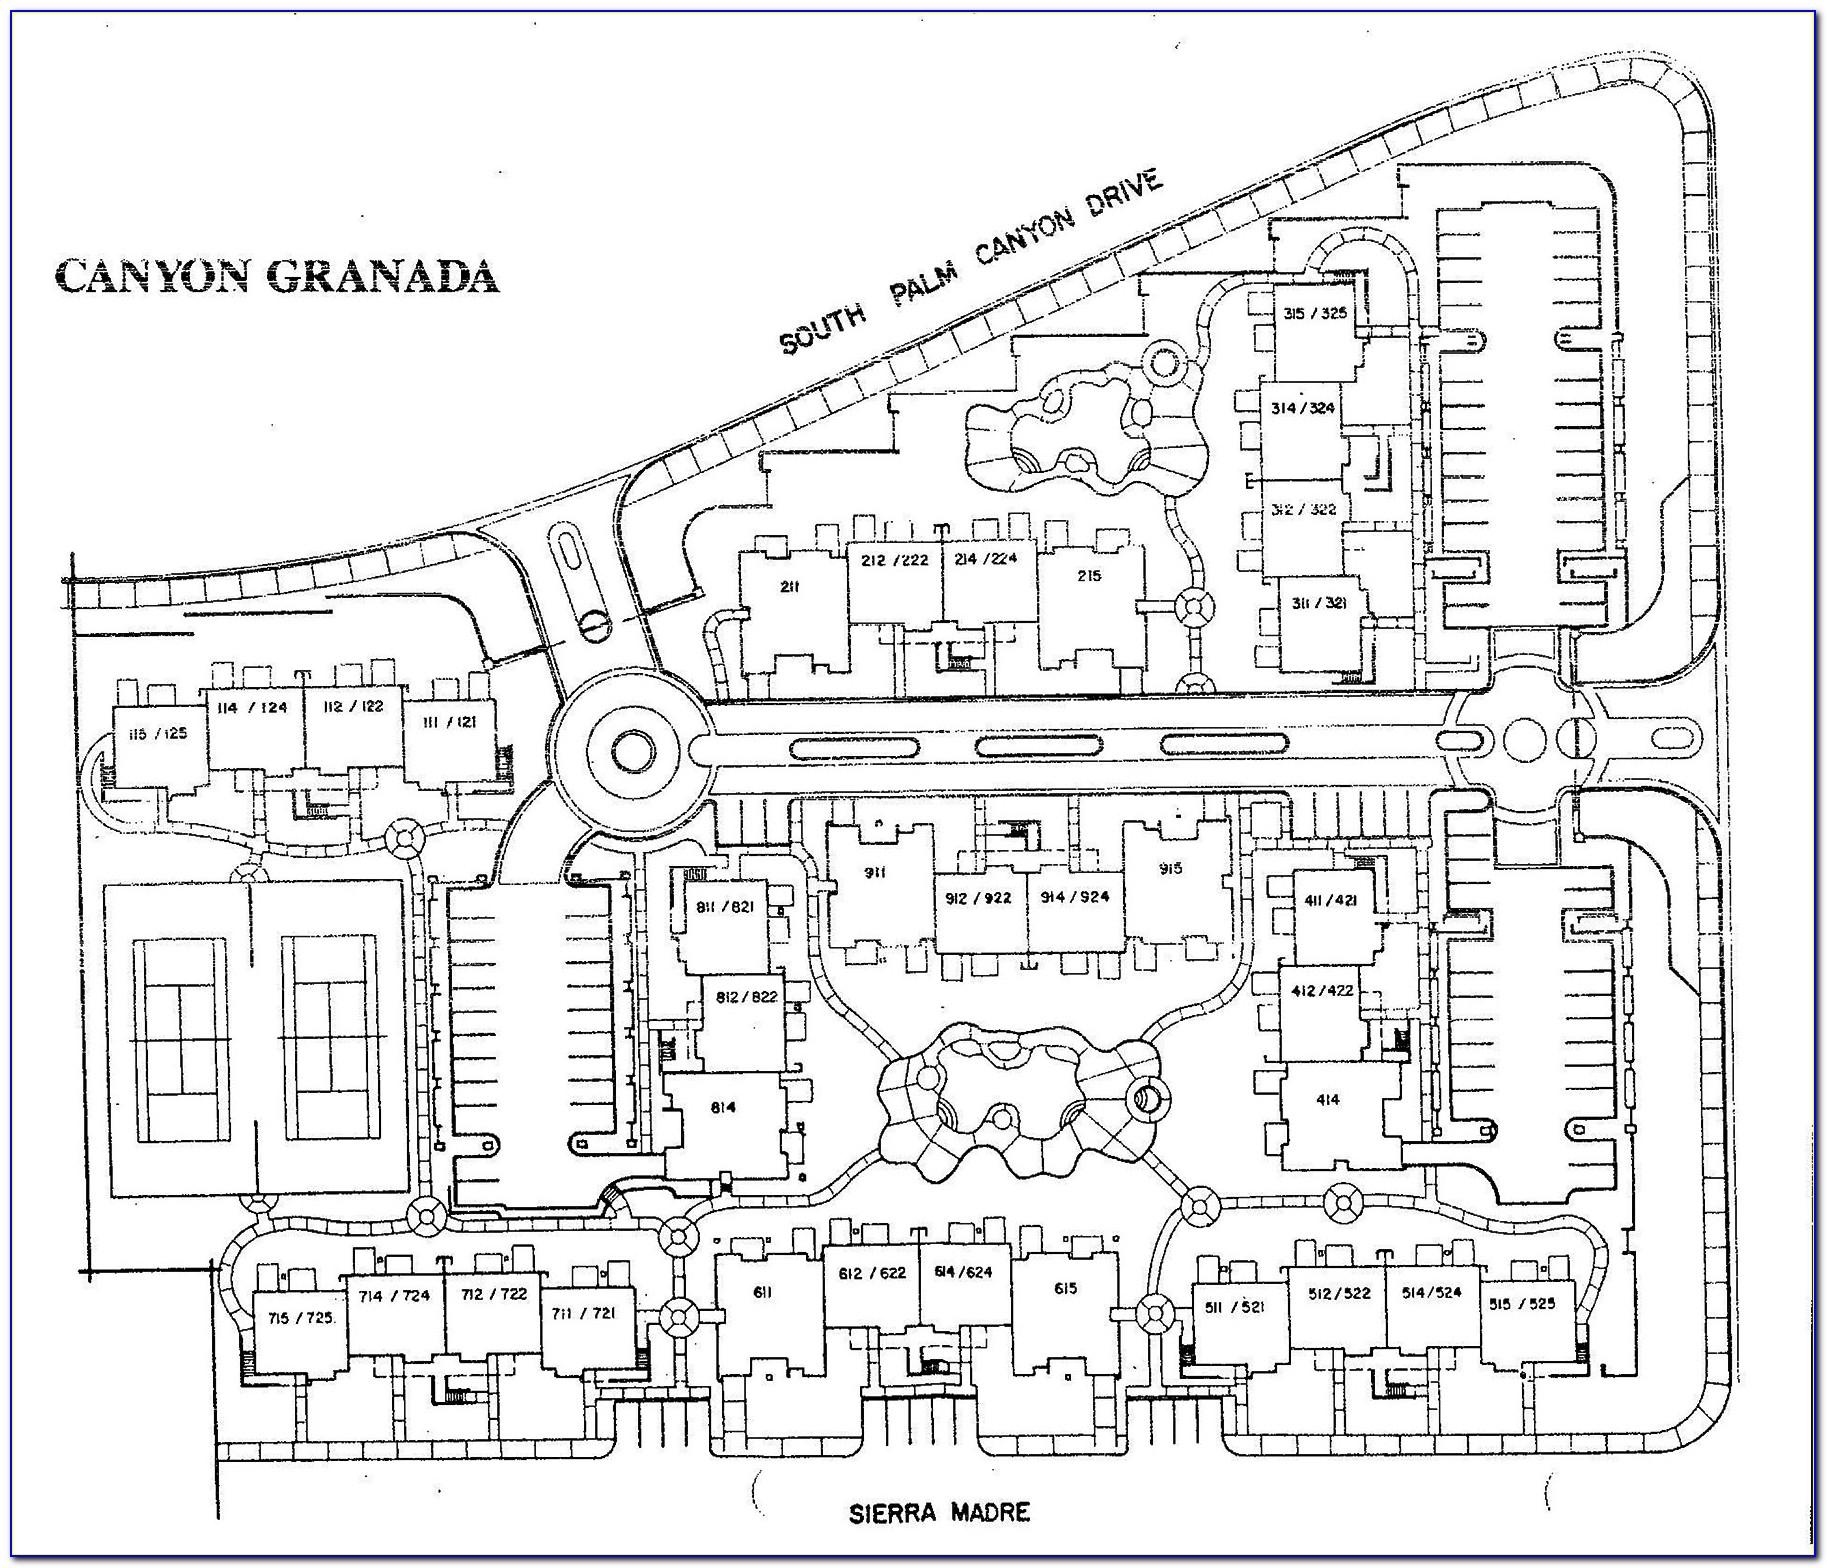 Legacy Villas La Quinta Property Map